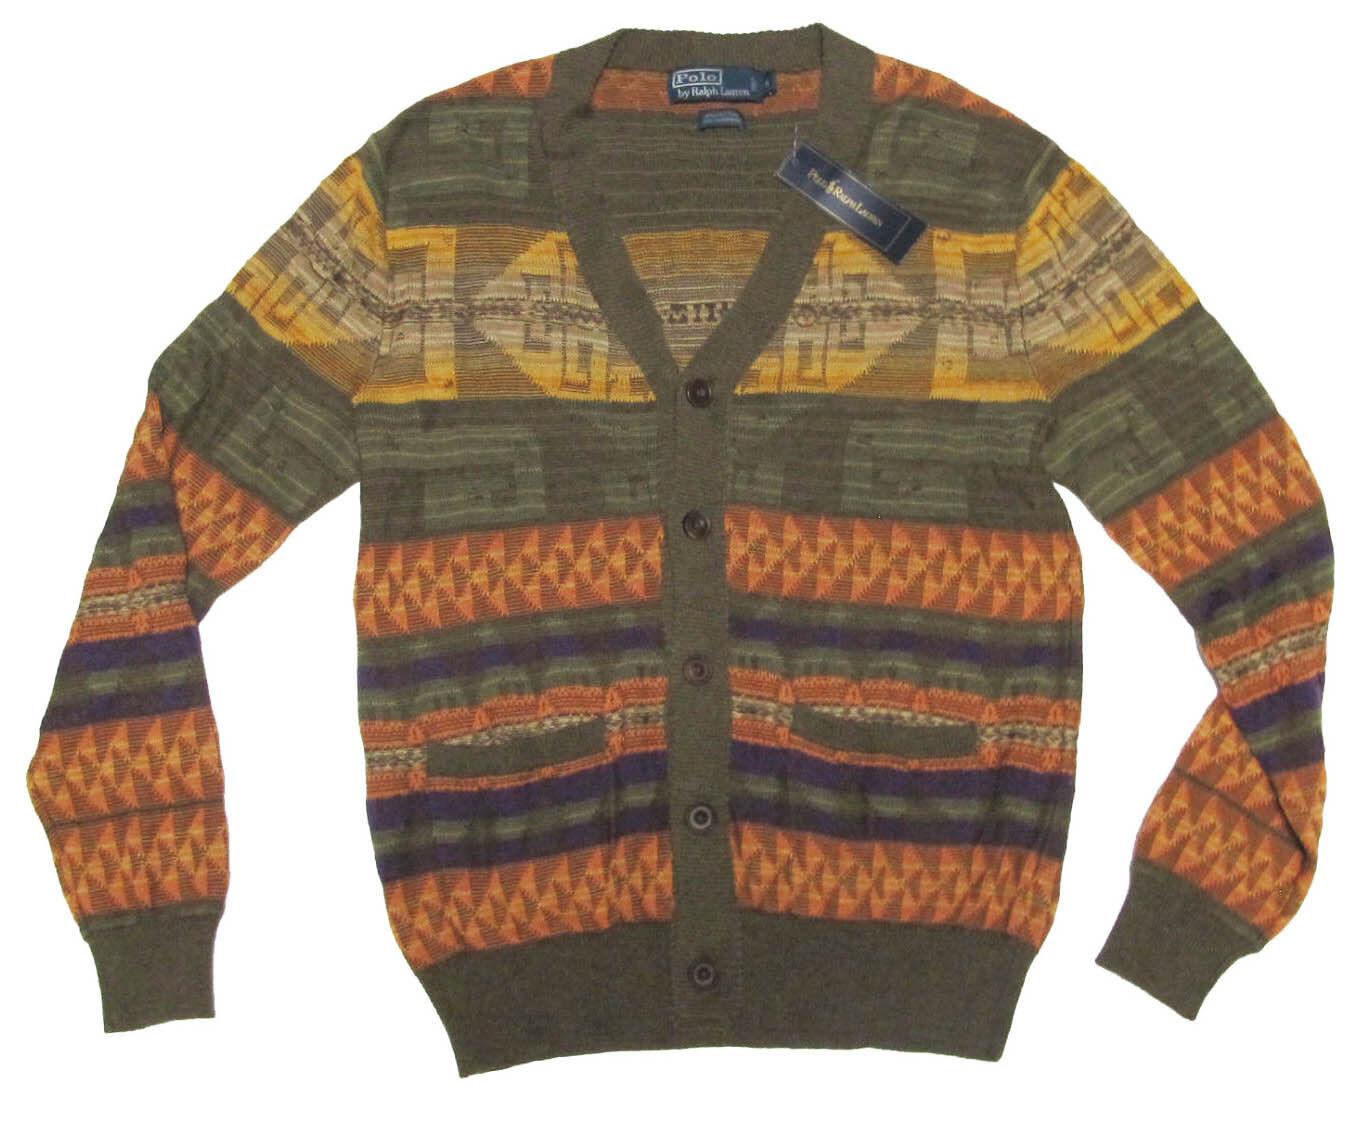 295 Polo Ralph Lauren Mens Southwestern Cashmere Knit Cardigan Sweater Jacket